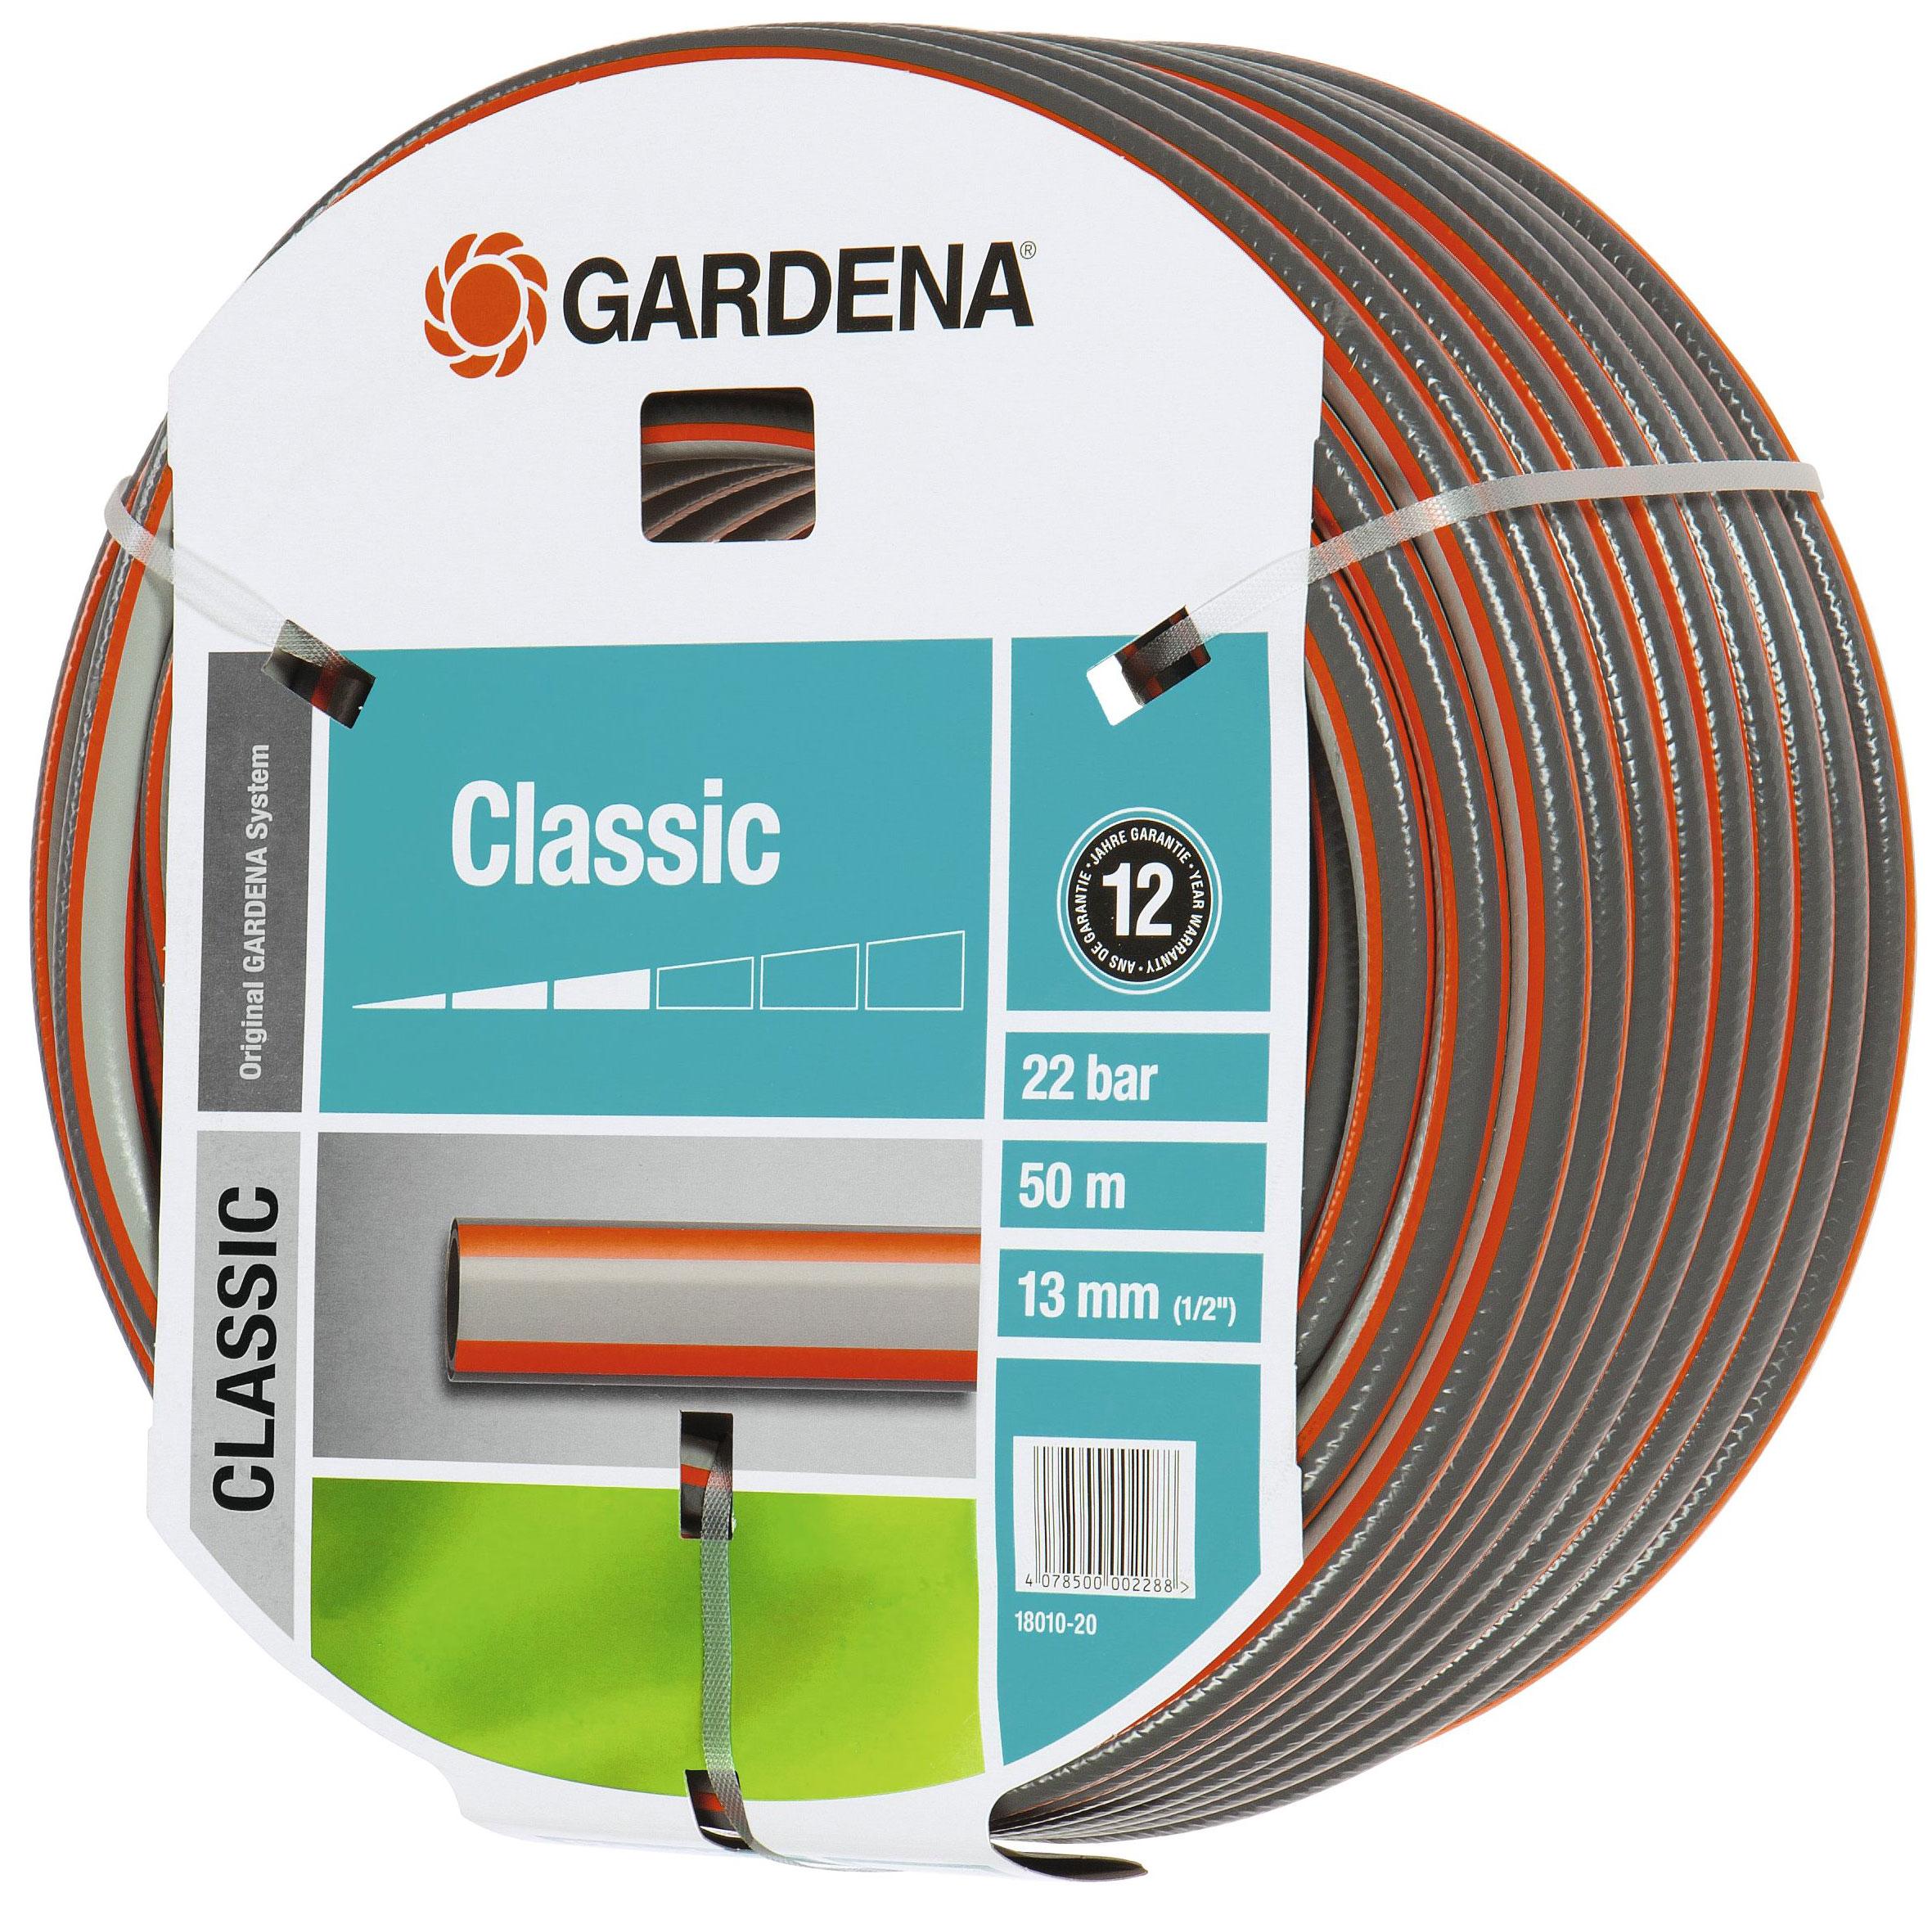 gardena classic schlauch 1 2 50m 1810 20 bei. Black Bedroom Furniture Sets. Home Design Ideas